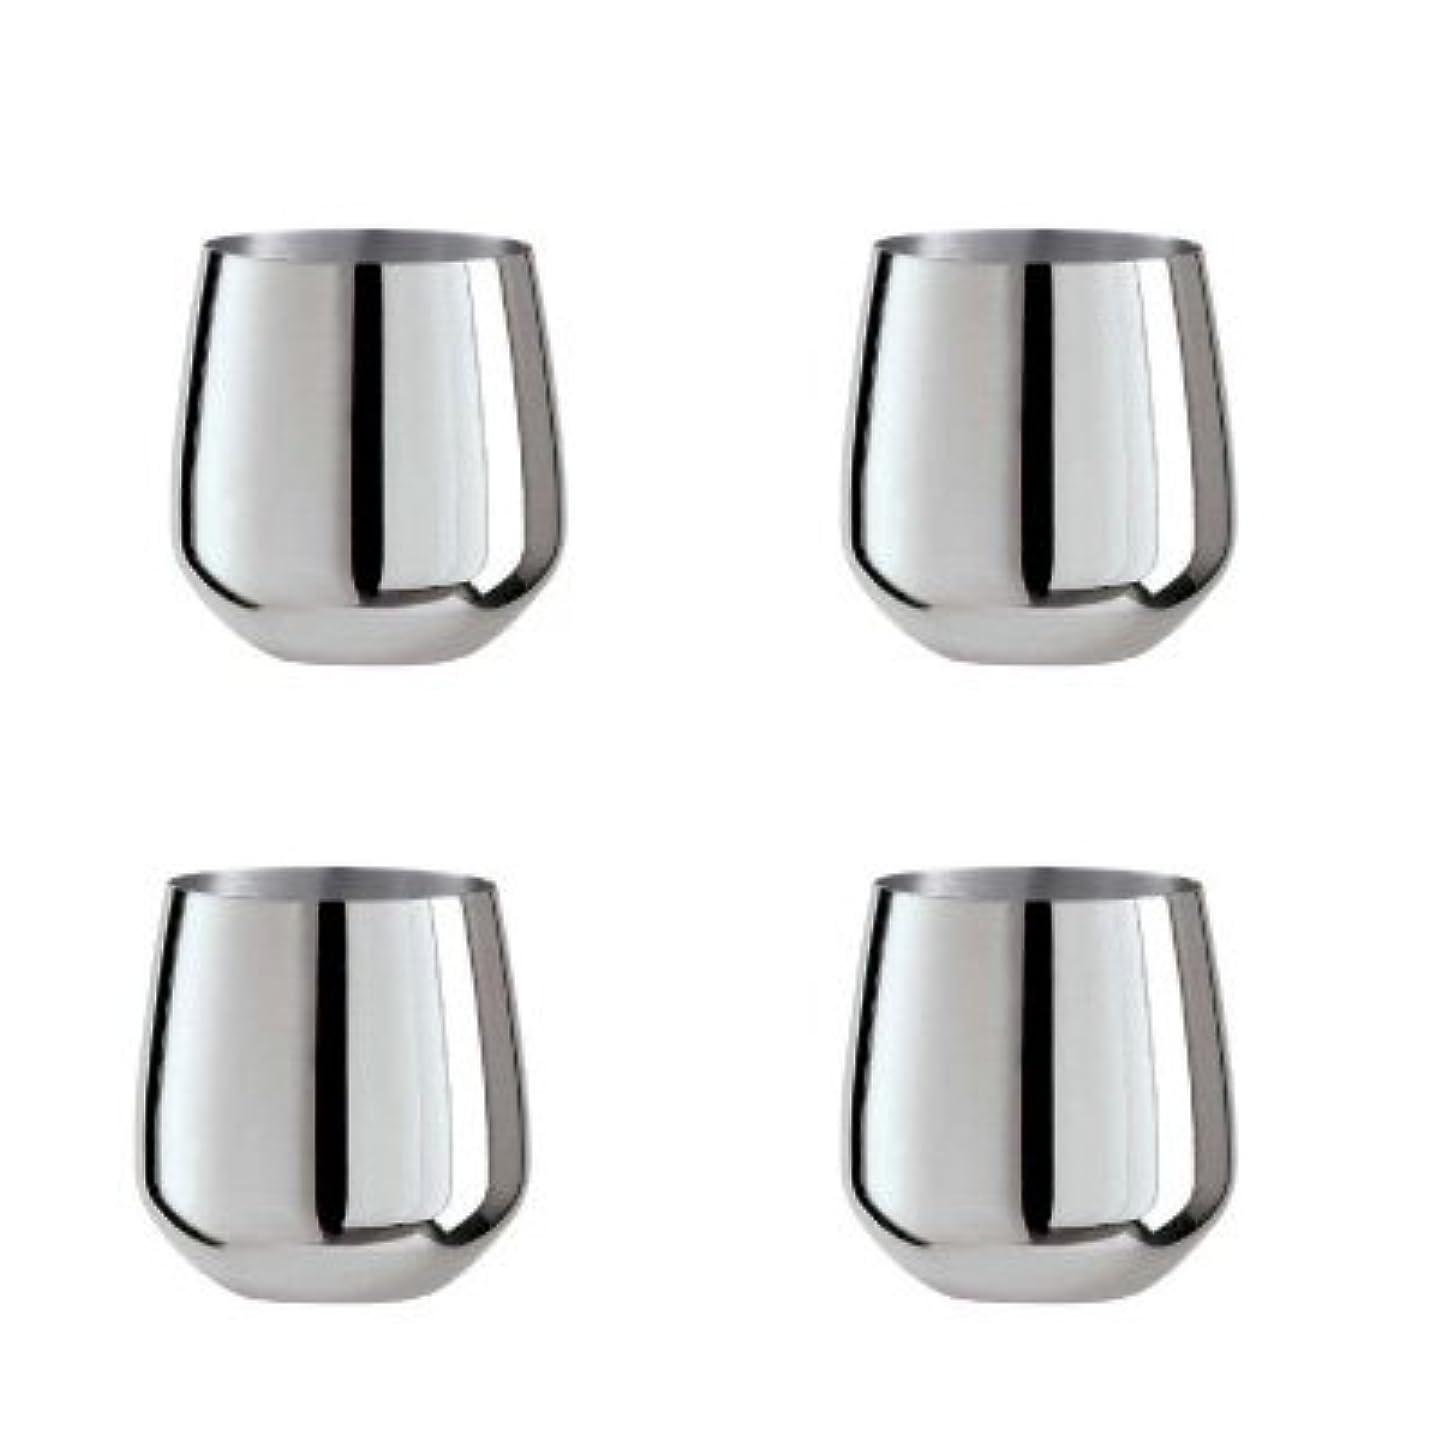 Oggi Set of 4 Stainless Steel Stemless Wine Glasses